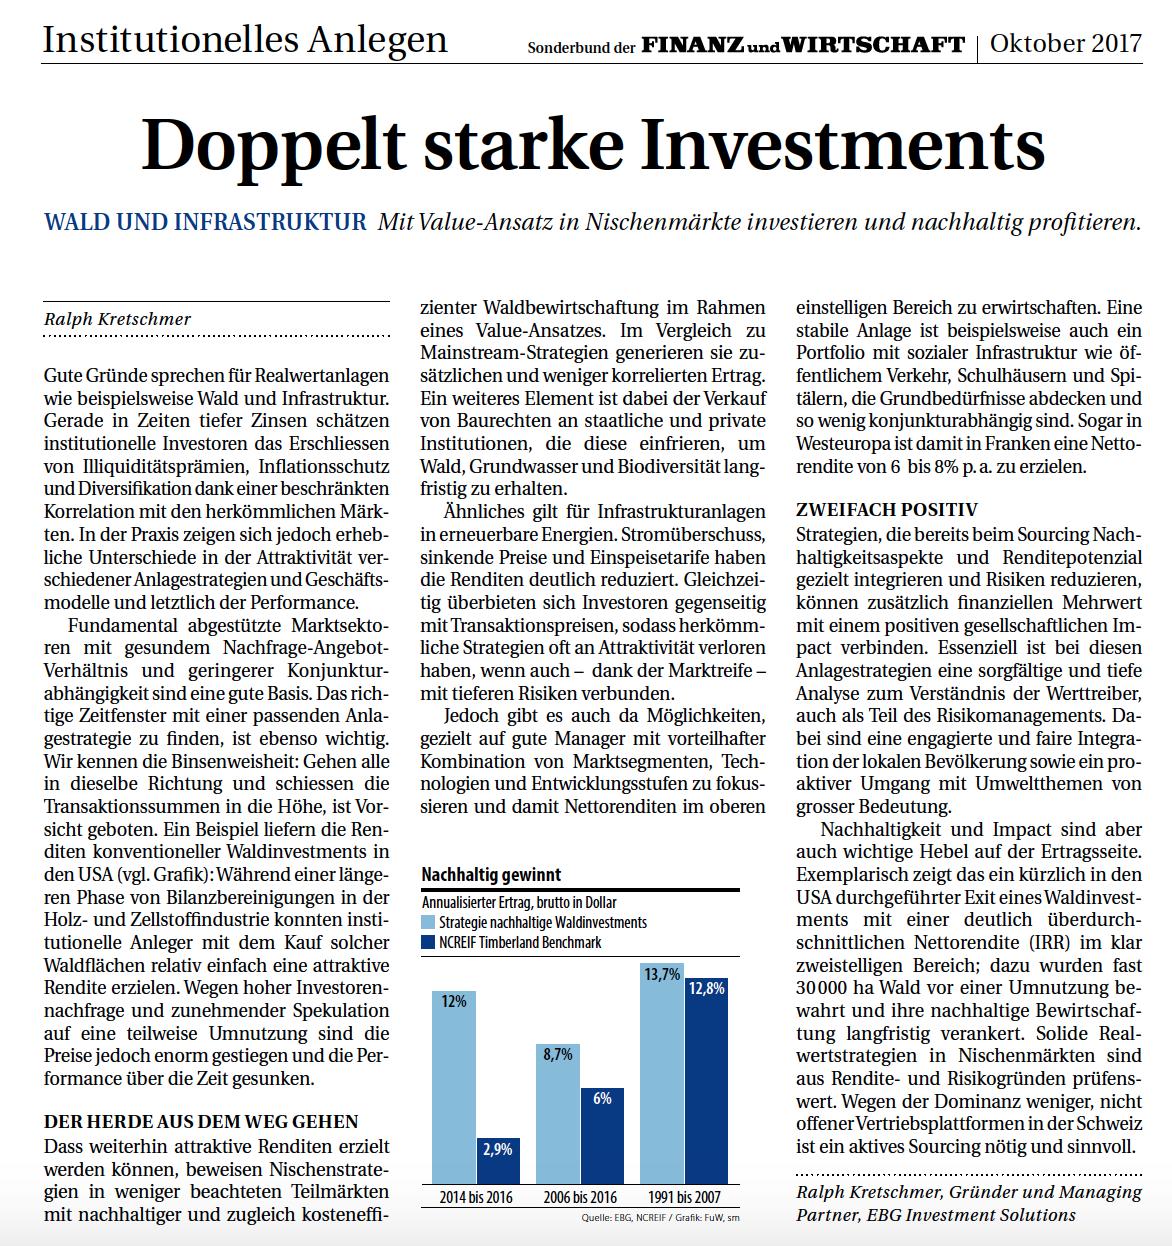 FuW: Sonderbeilage Institutionelles Anlegen: Doppelt starke Investments (S. 23)